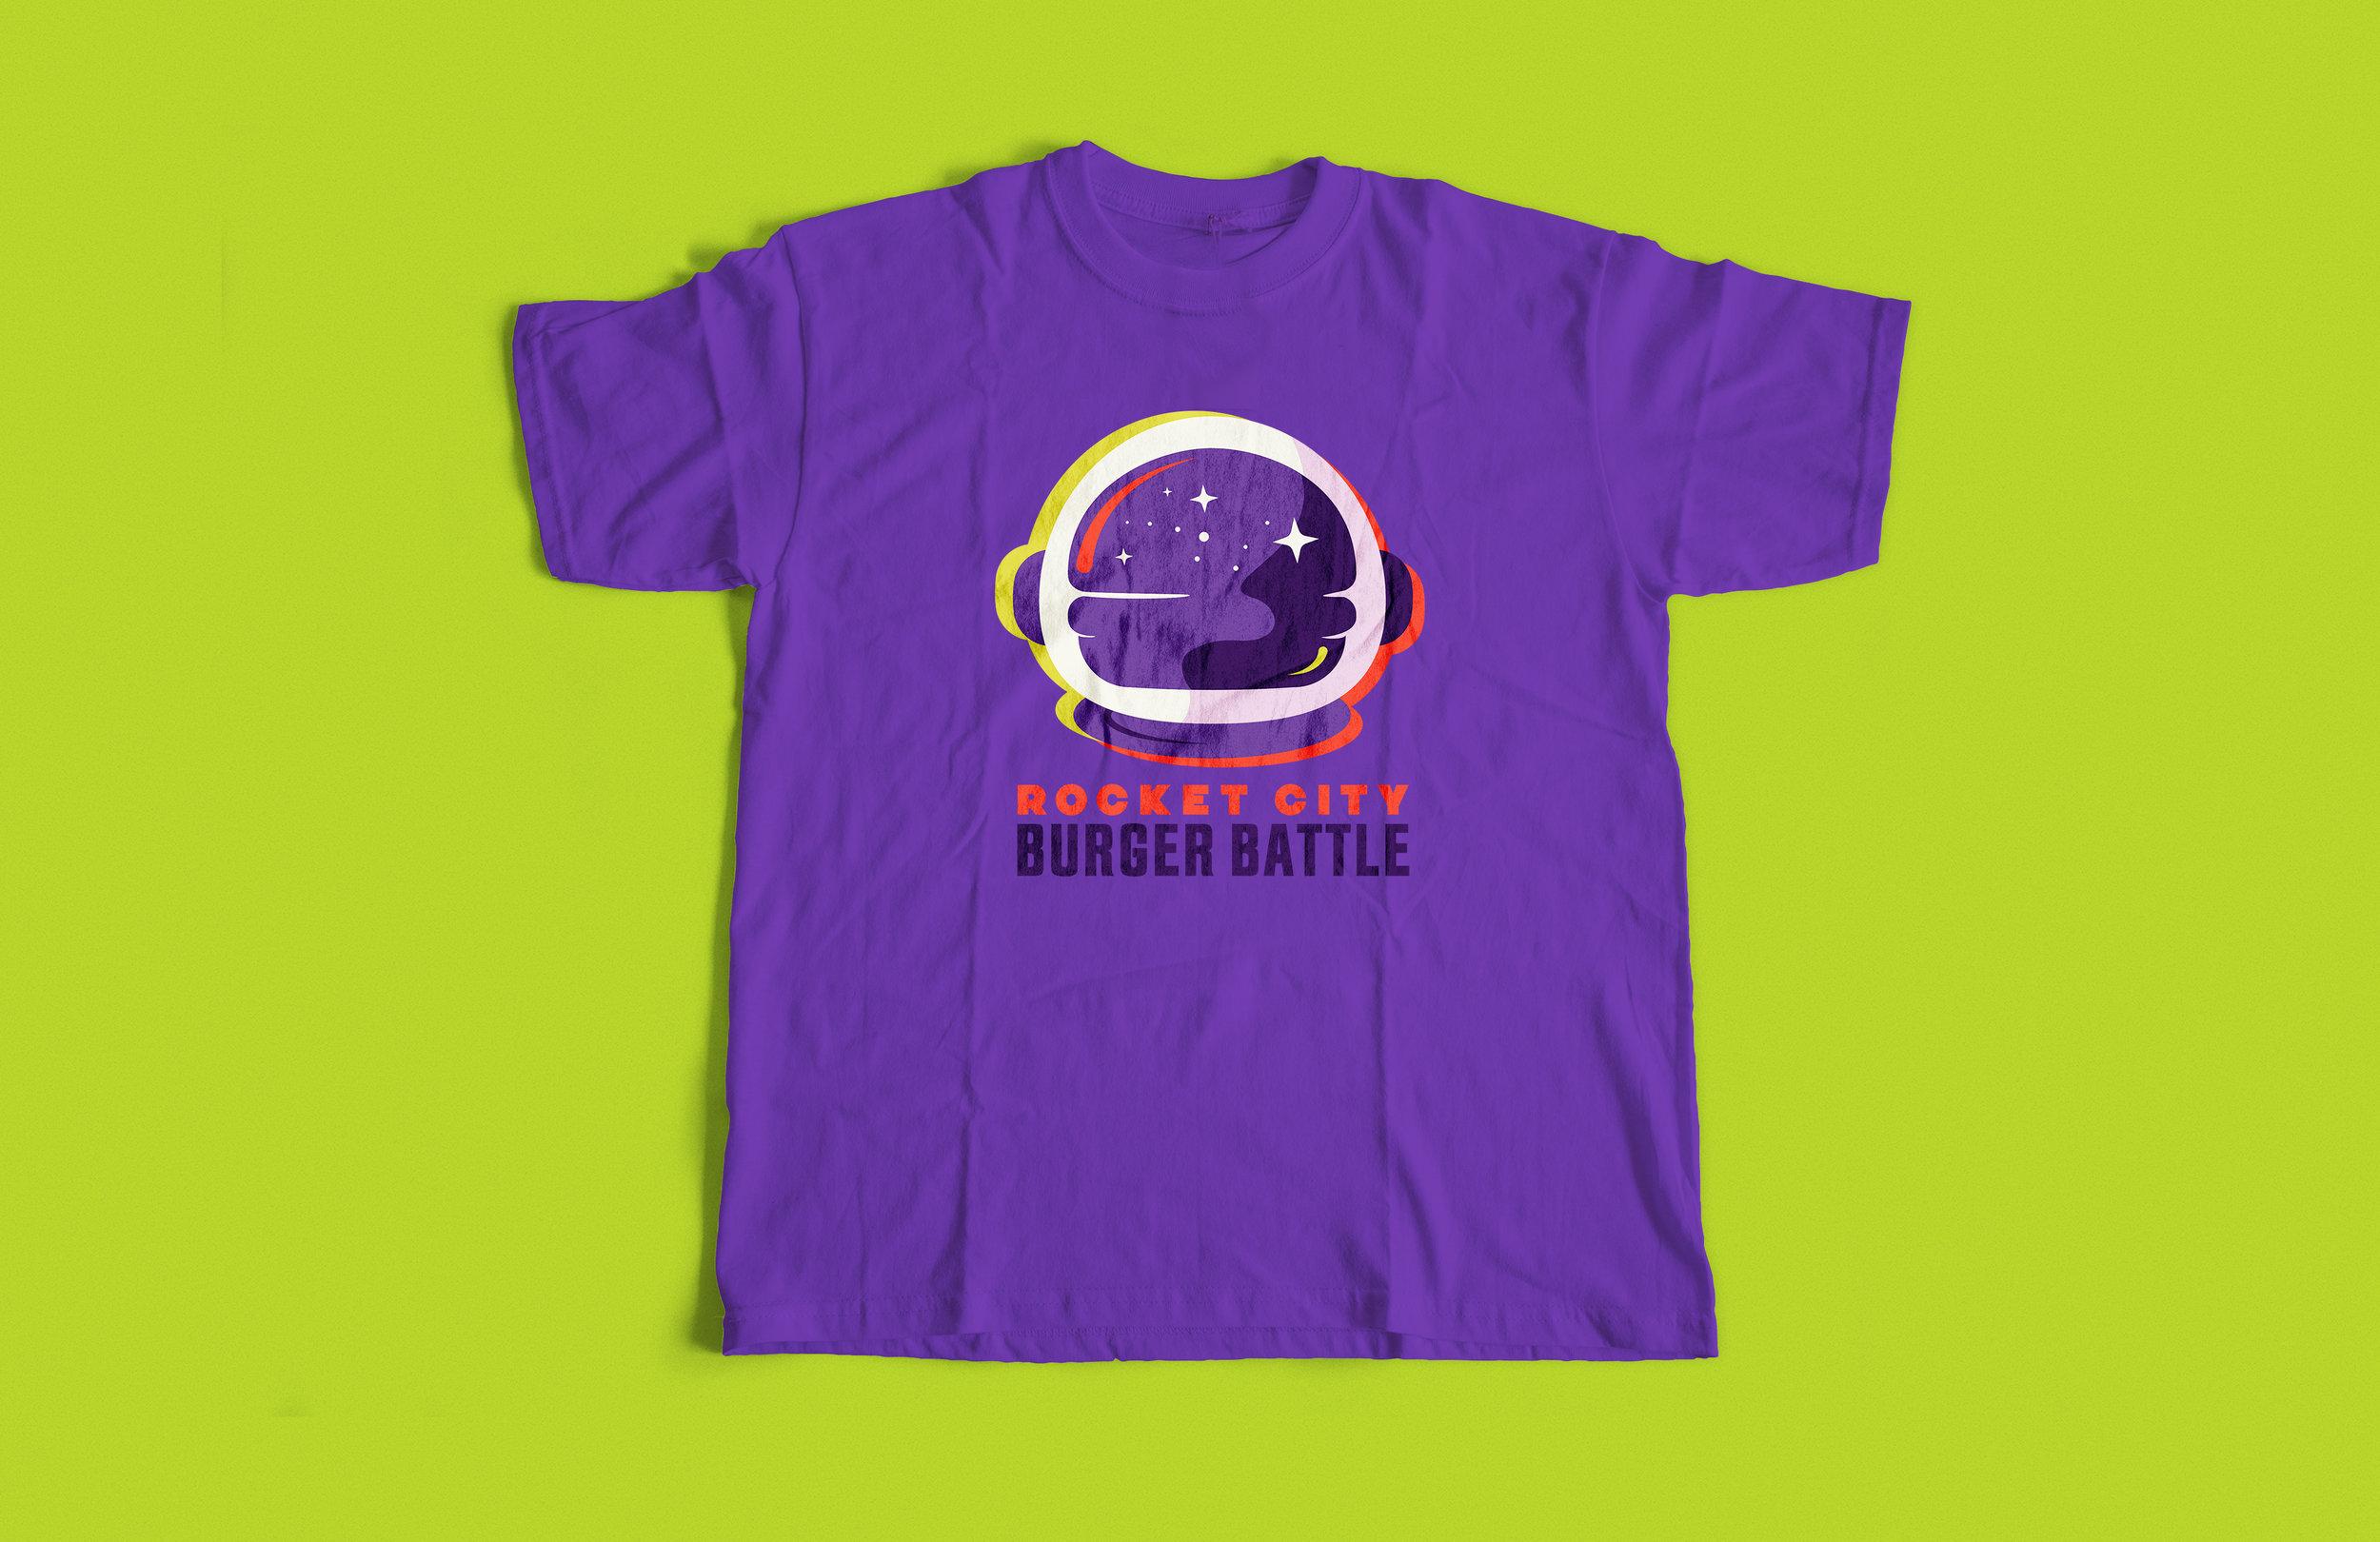 Campus805_BurgerBattle_Logo_shirt-mockup-2.jpg